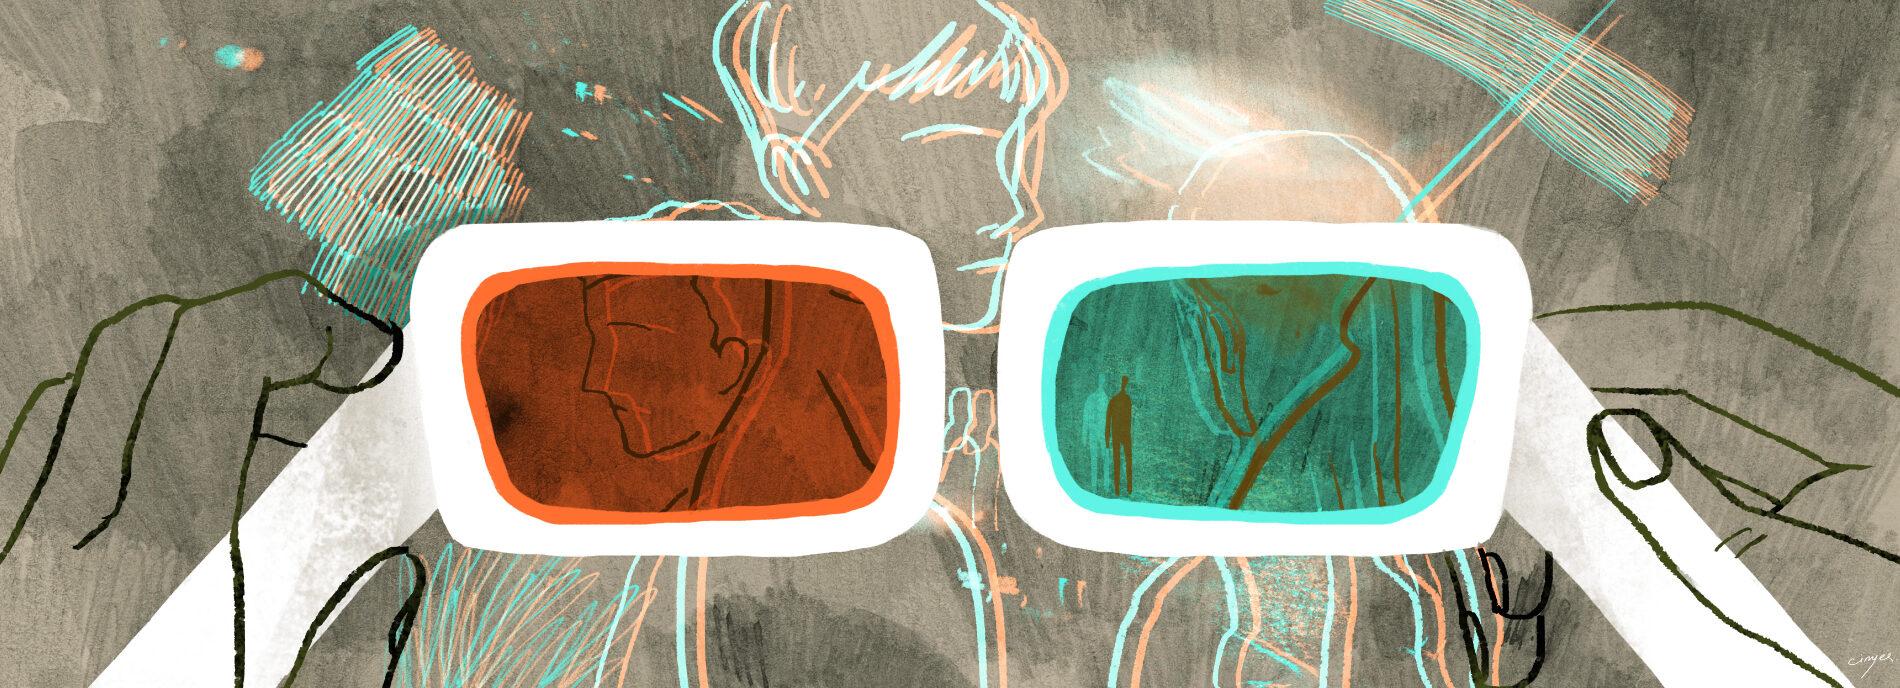 3d观看小组的眼镜。